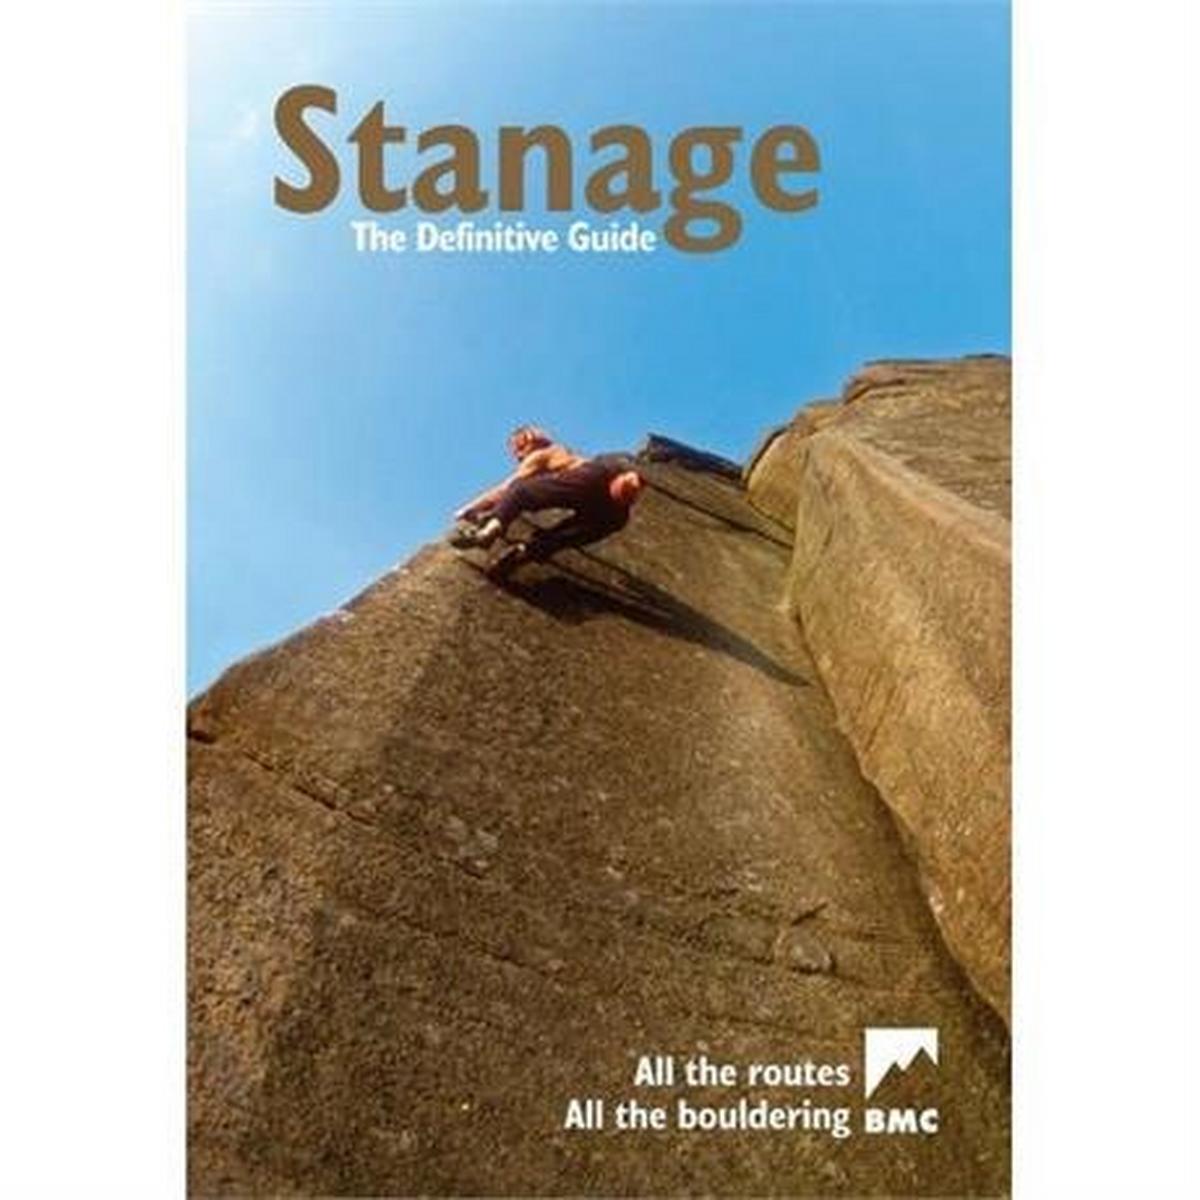 Bmc Climbing Guide Book: Stanage